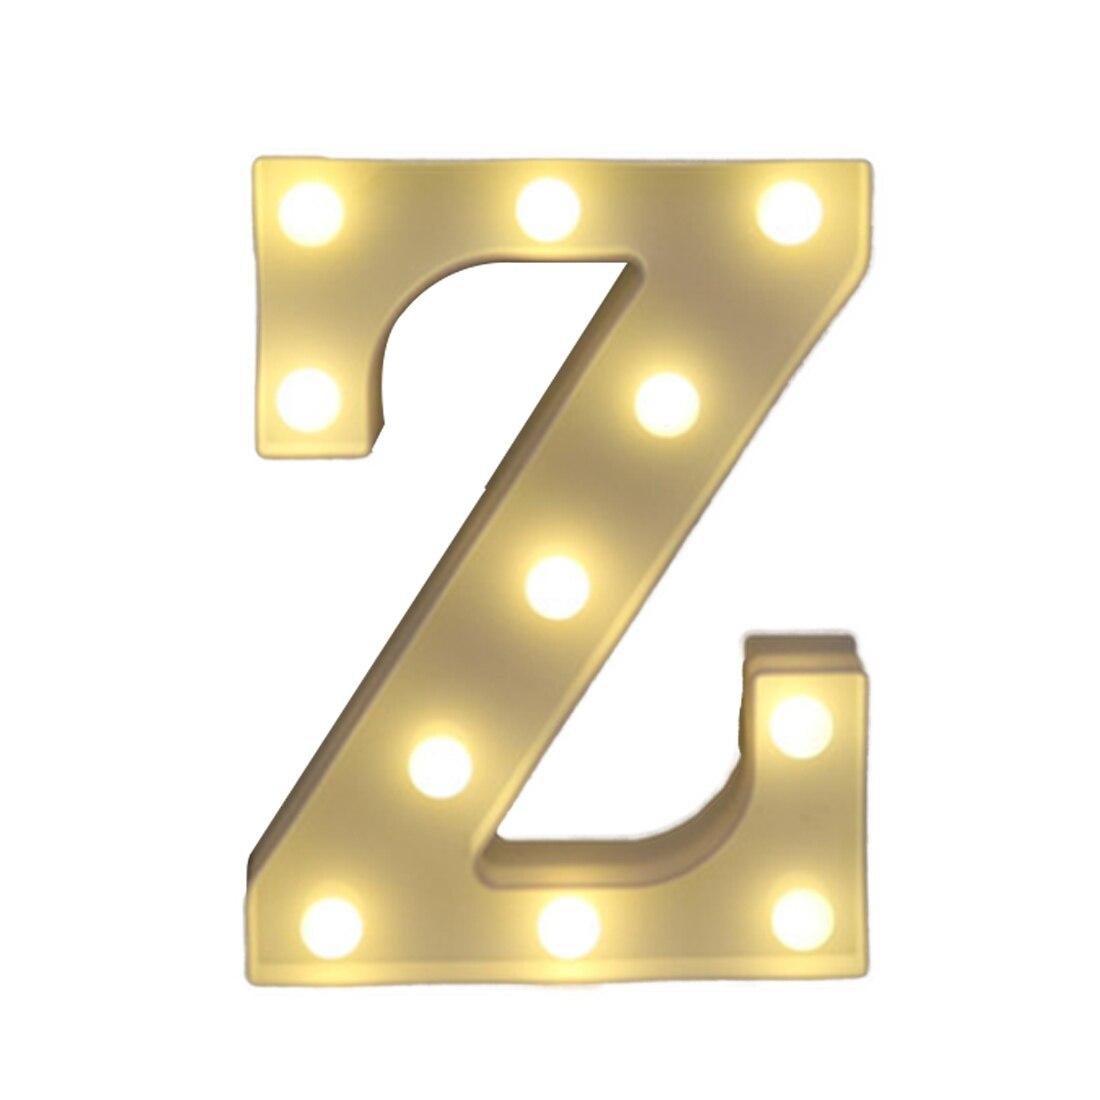 Hot Sale Light Up U-z Decoration Symbol Indoor Wall Alphabet Letter Led Light White Decoration Wedding Party Window Display Light